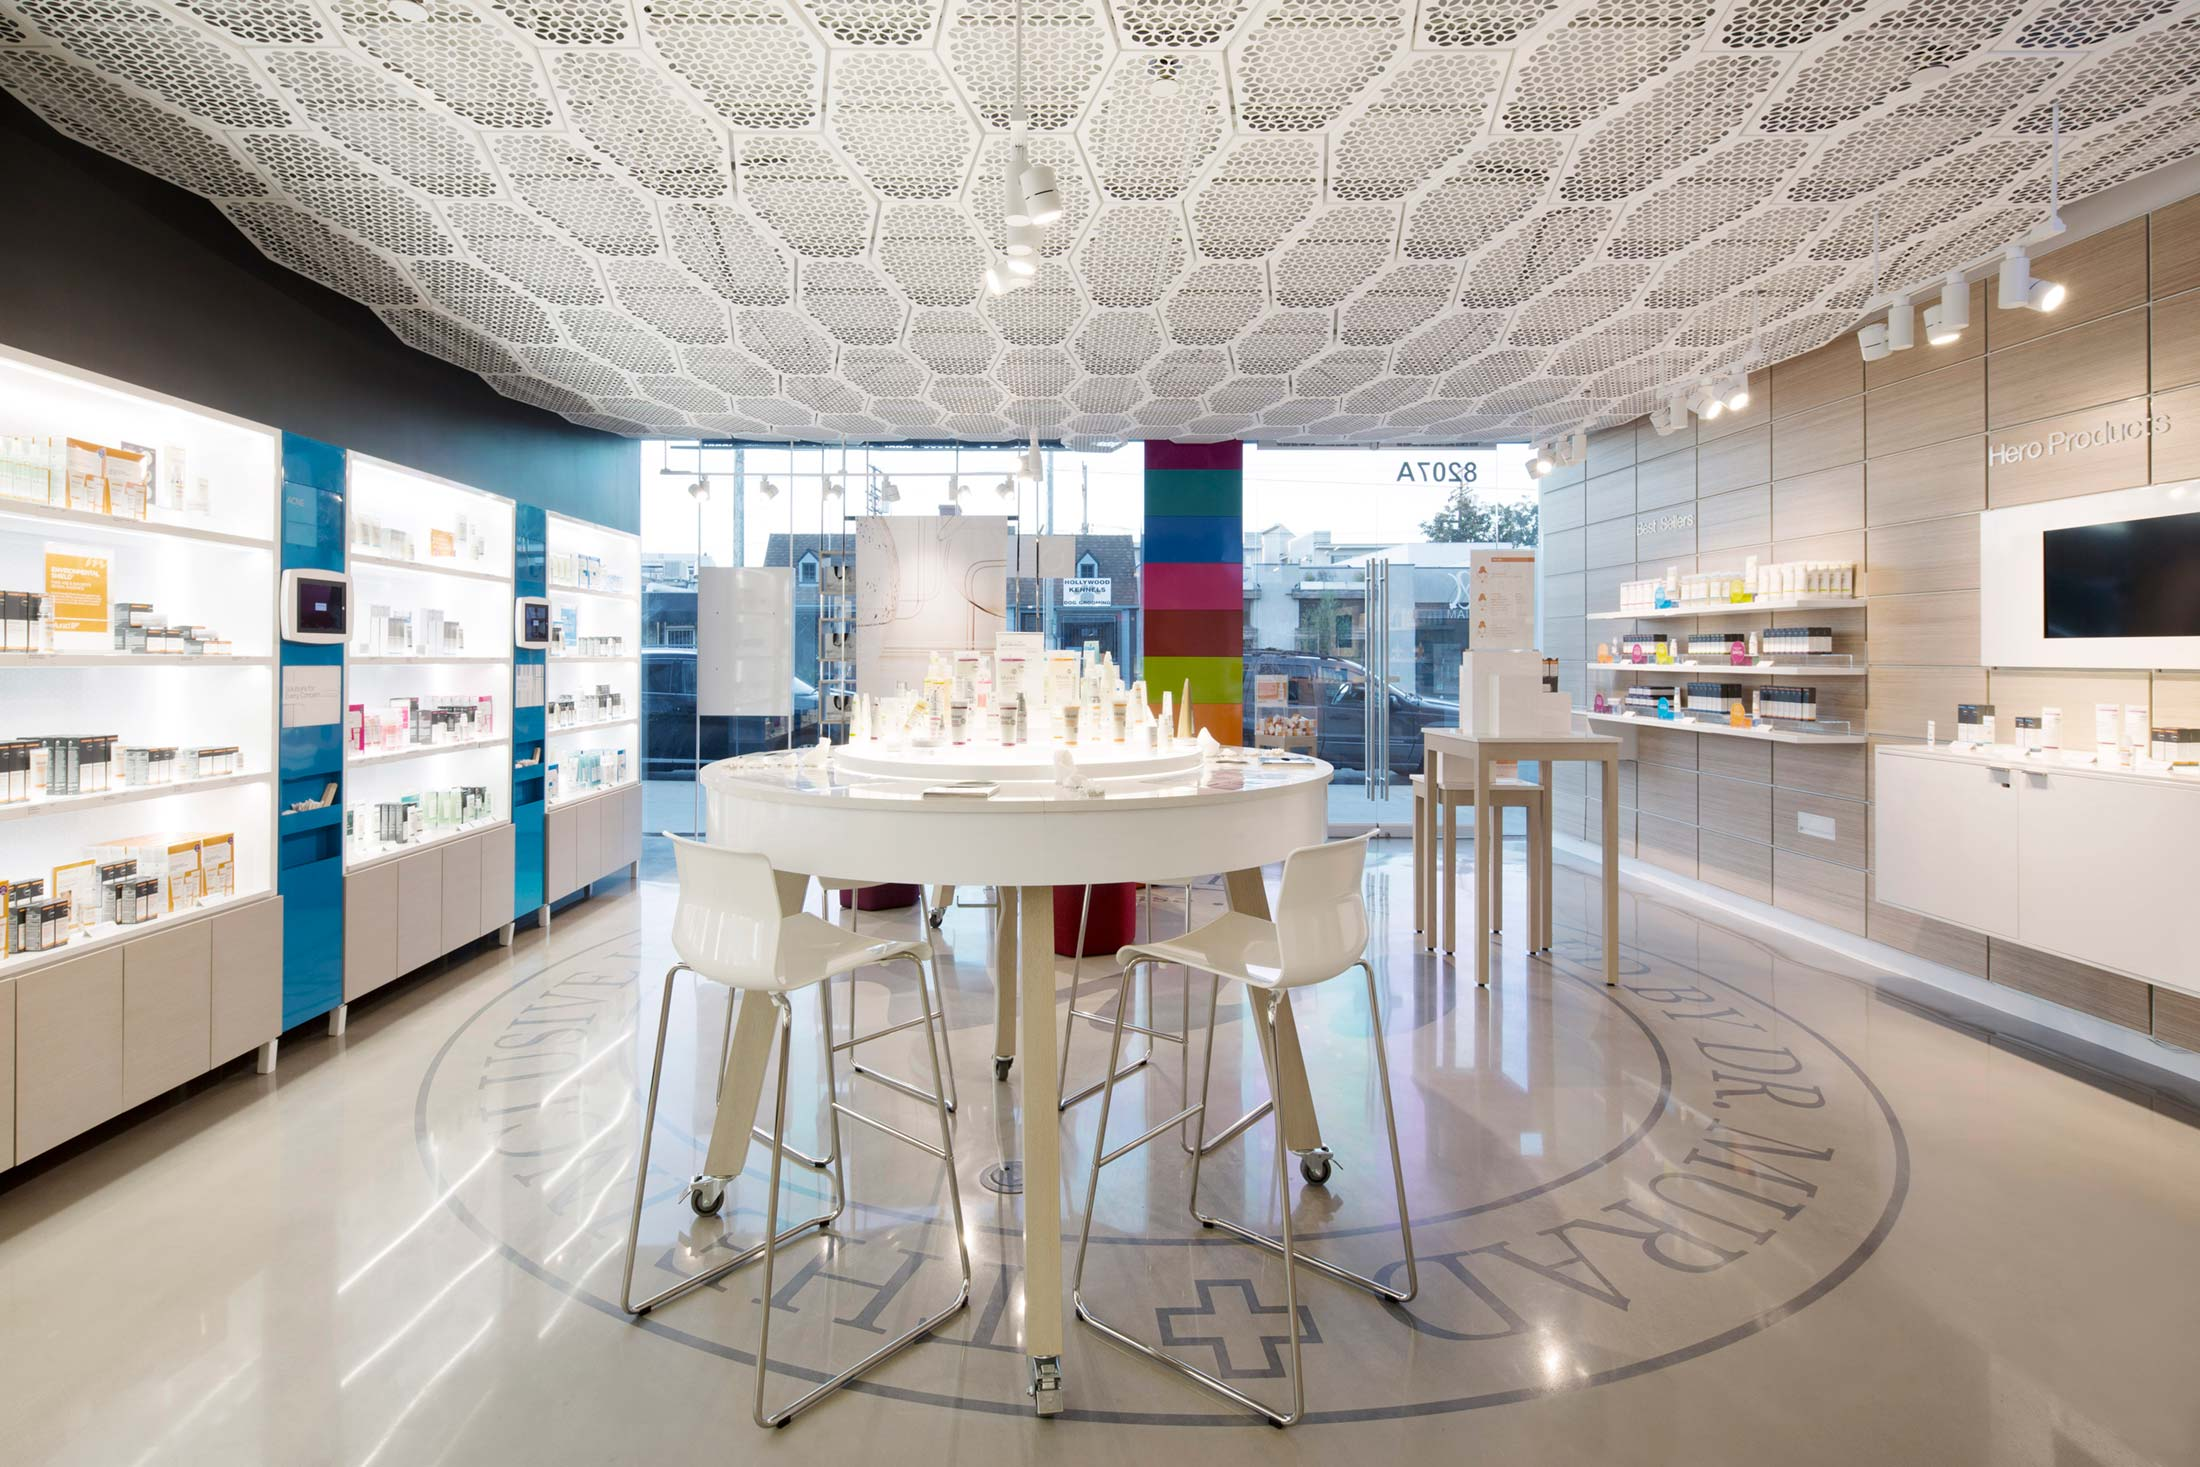 modern-architecture-commercial-interiors-retail-branded-custom-fabrication-award-winning-california-shubindonaldson-murad-retail-02